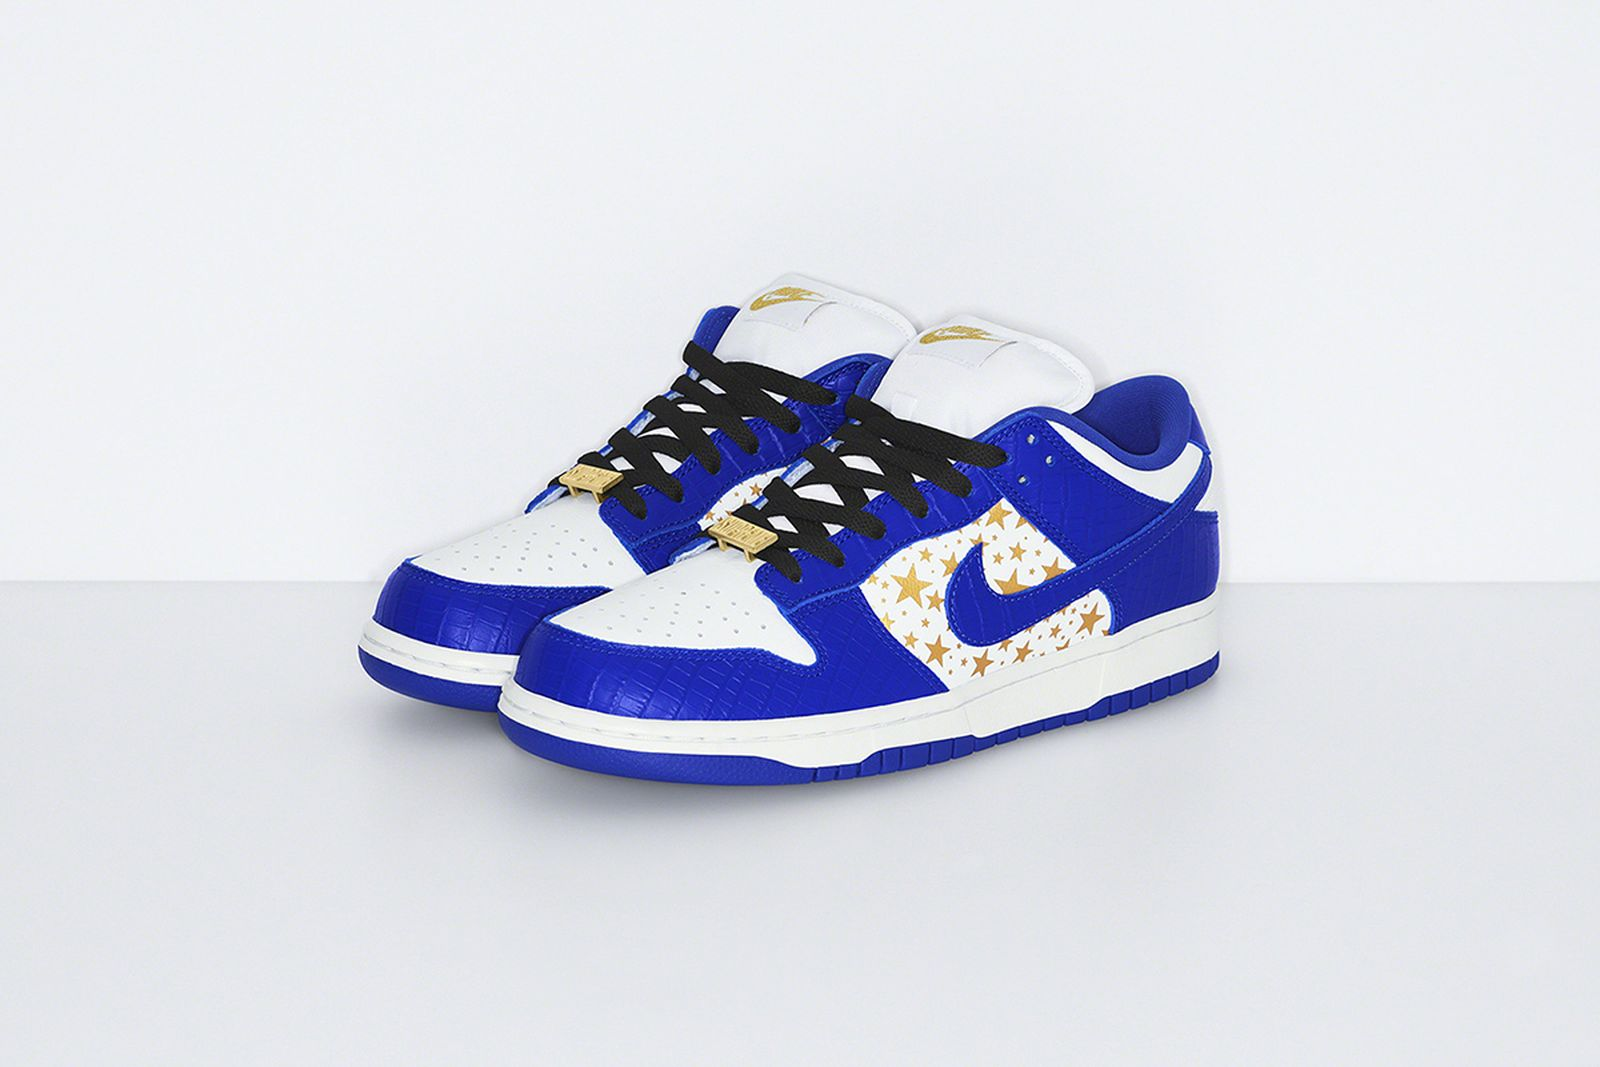 supreme-nike-sb-dunk-low-hyper-blue-release-date-price-07